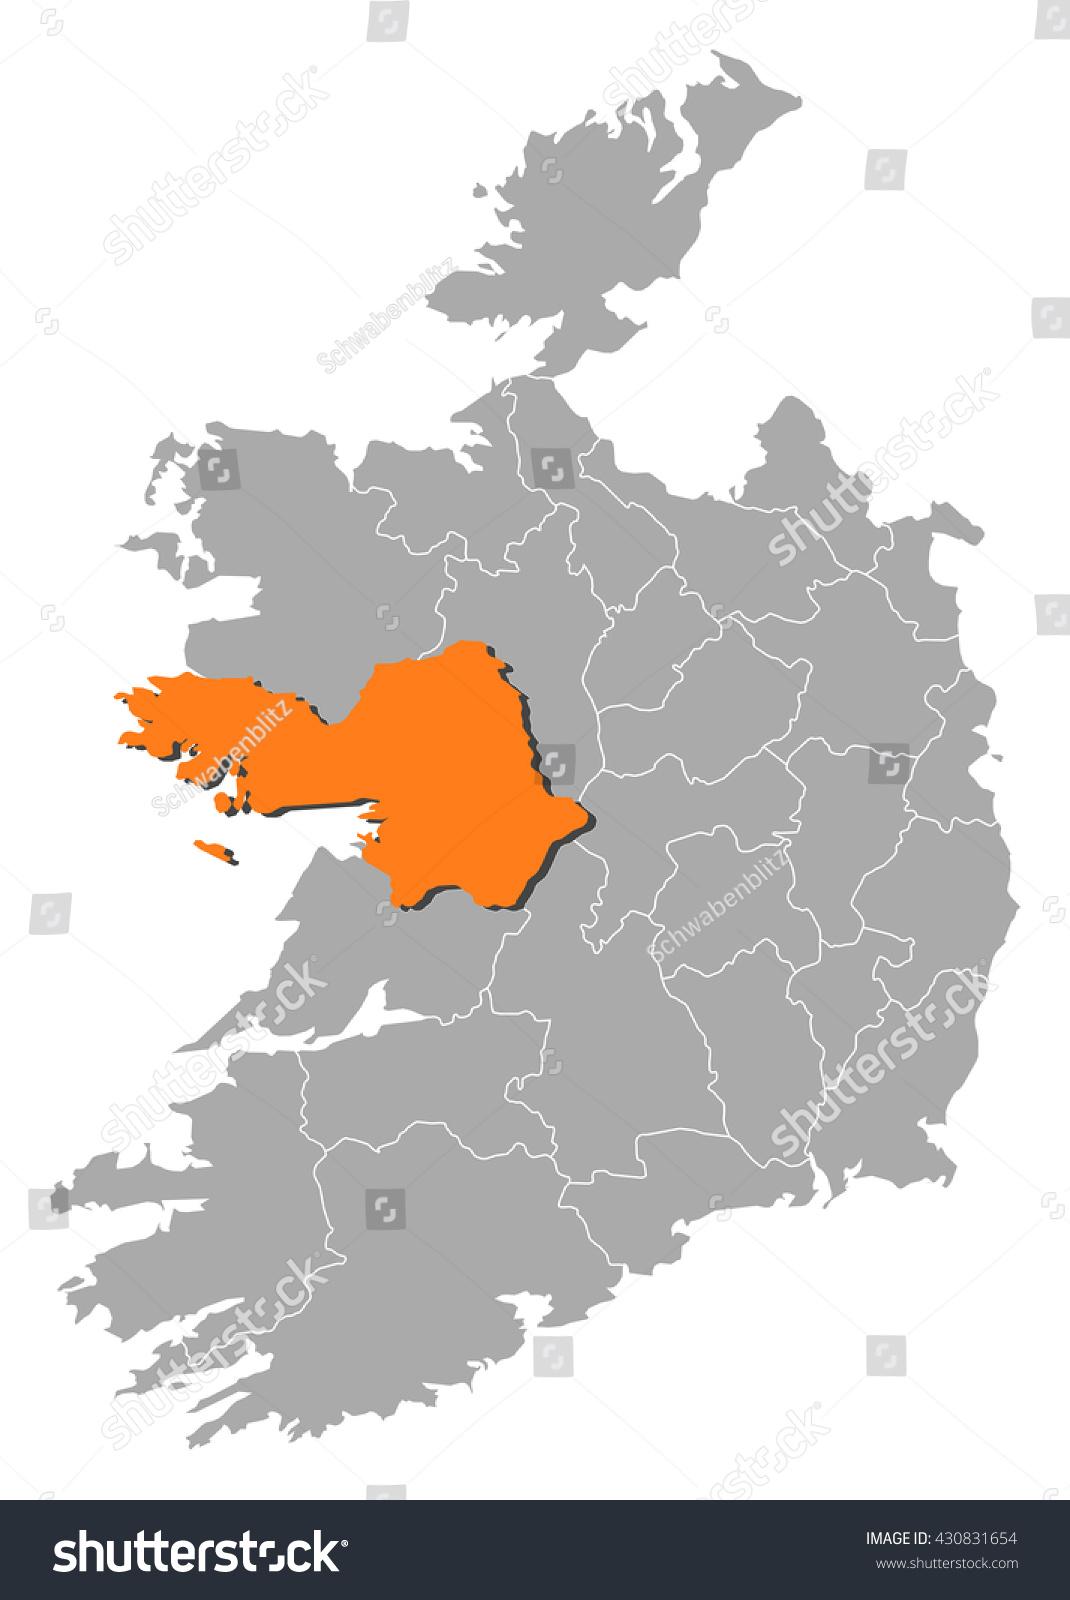 Map Of Ireland Galway.Map Ireland Galway Stock Vector Royalty Free 430831654 Shutterstock